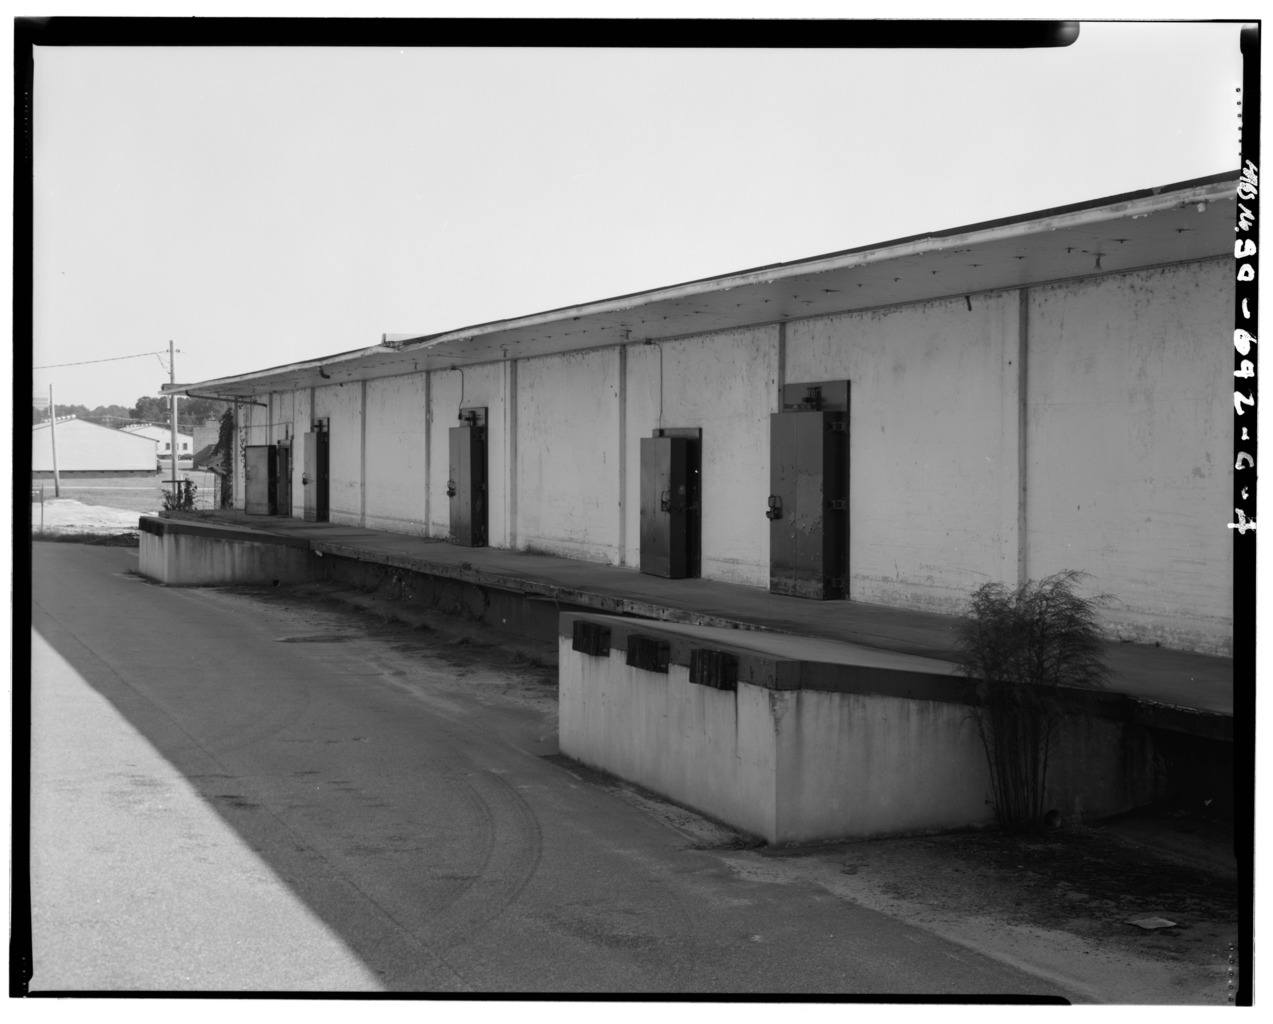 Filefort Jackson Cold Storage Plant East Side Parade & Jackson Cold Storage - Listitdallas